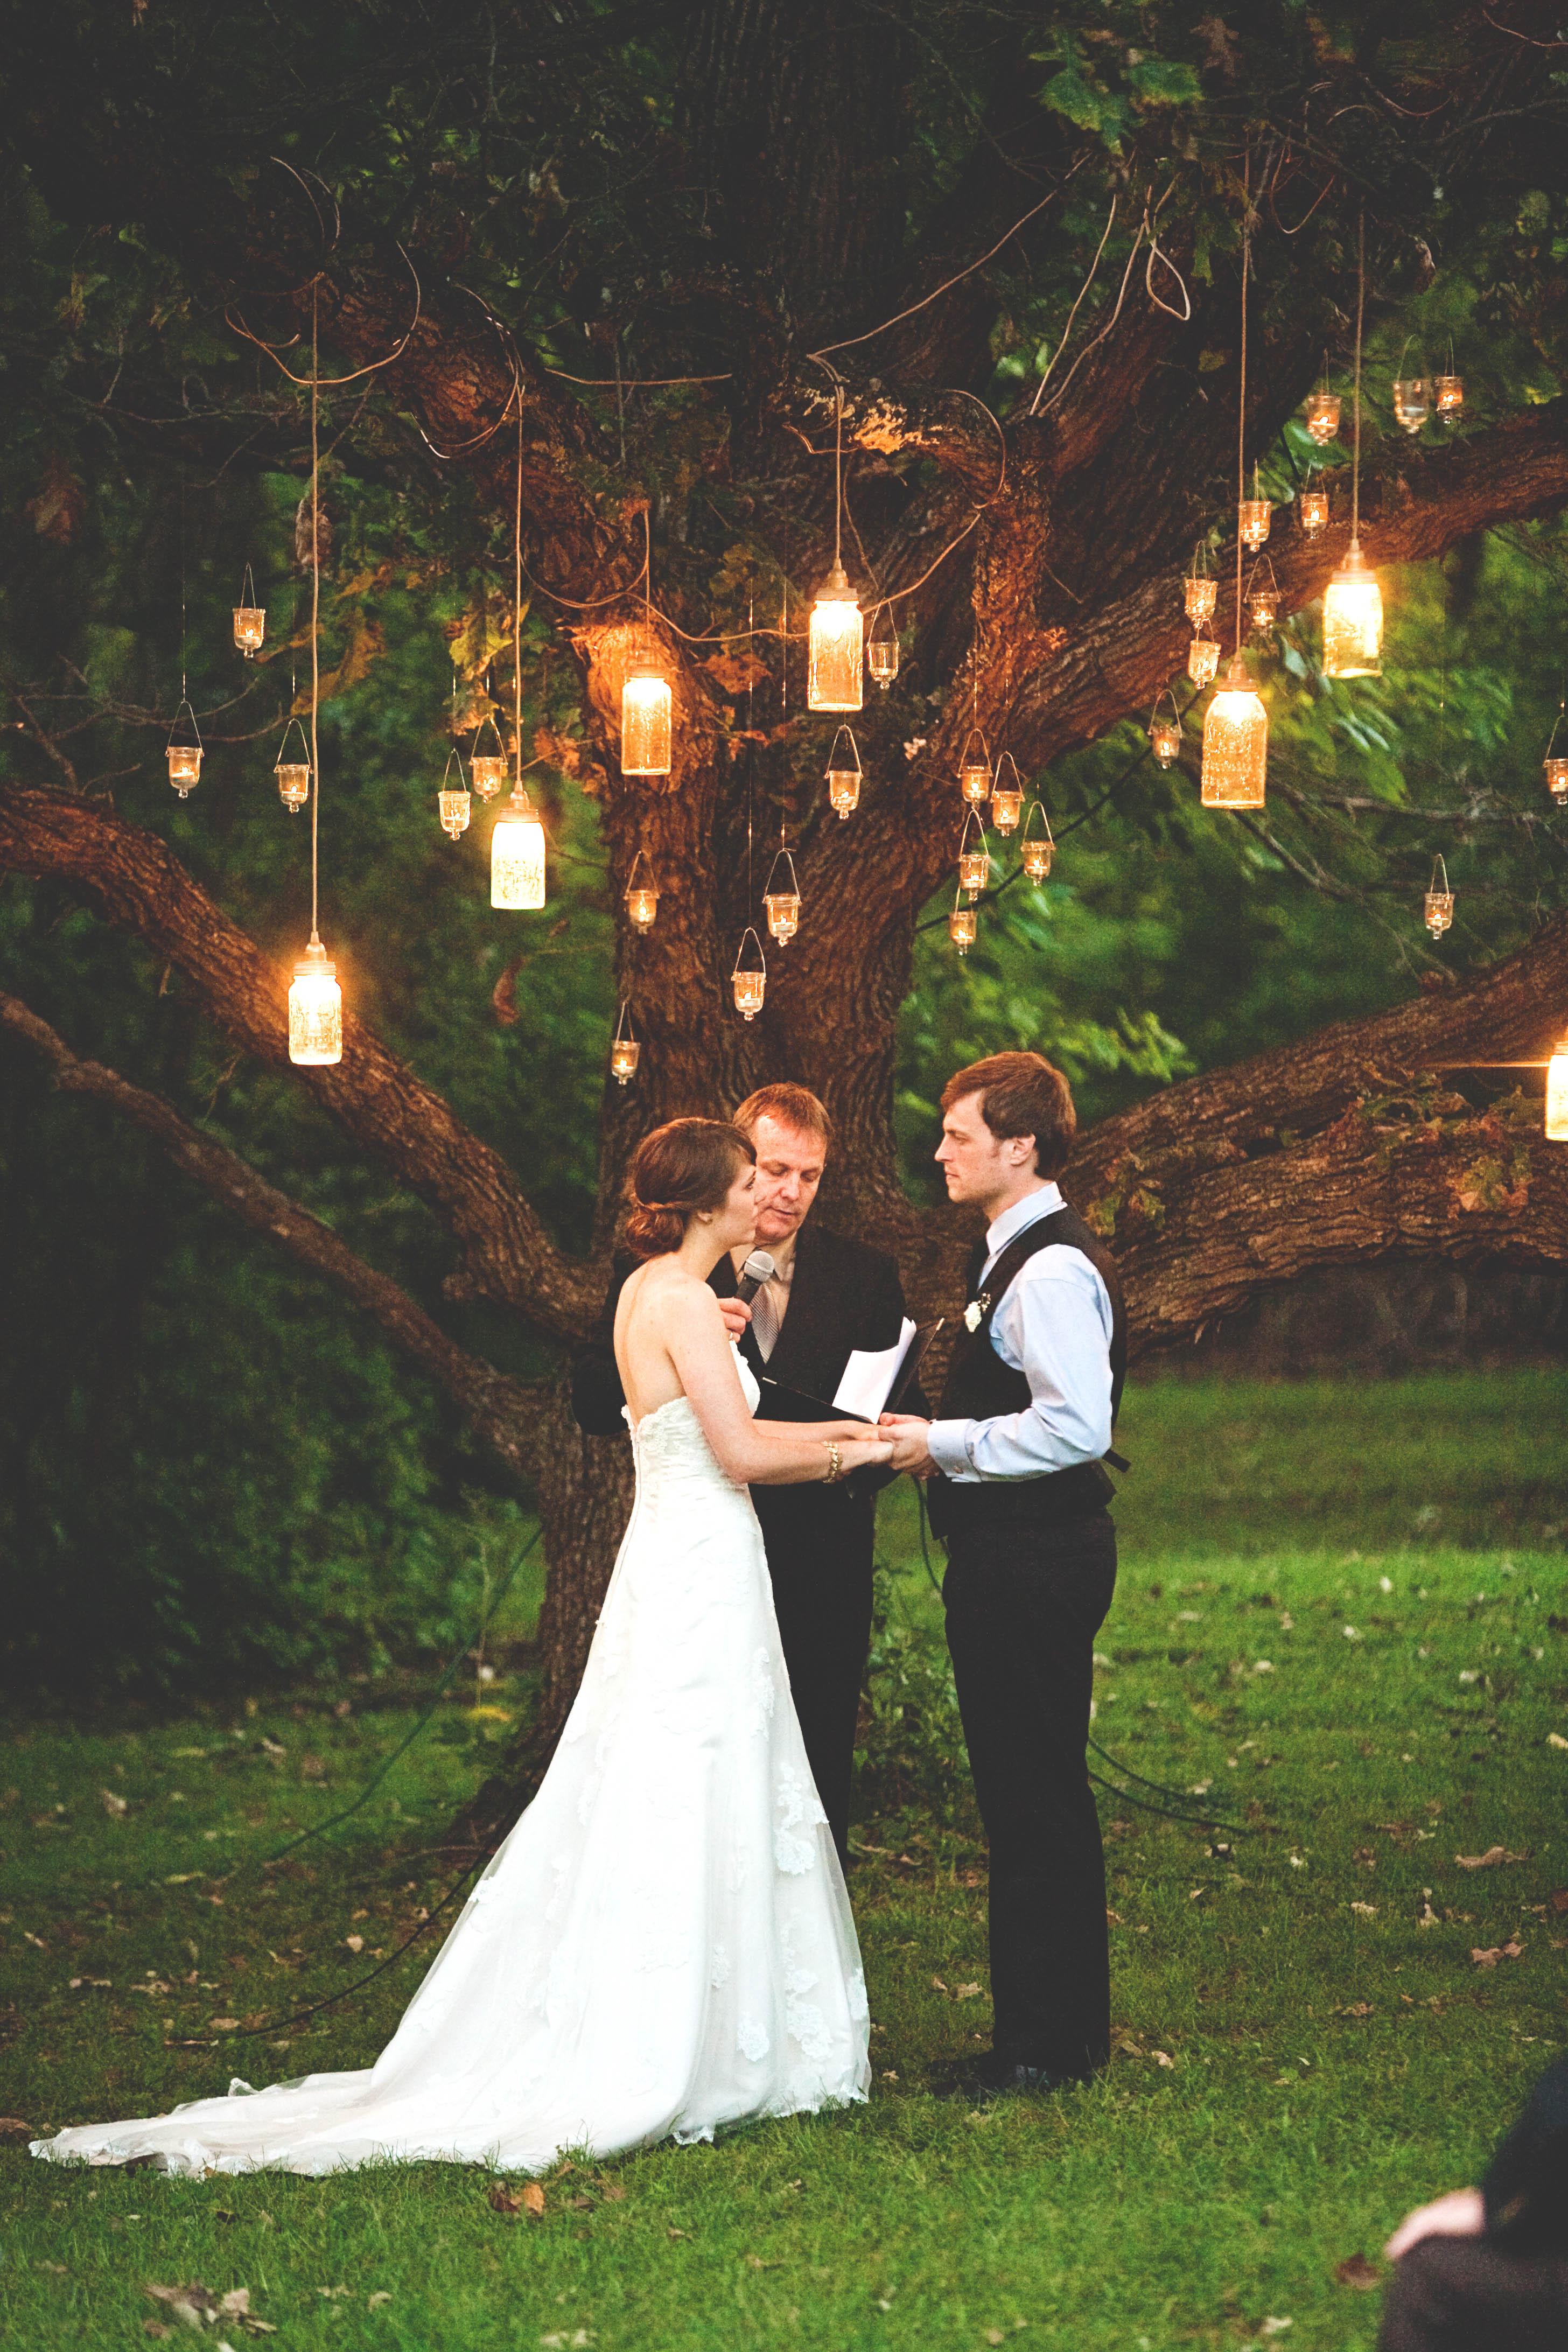 23 Mason Jar Ideas From Real Weddings